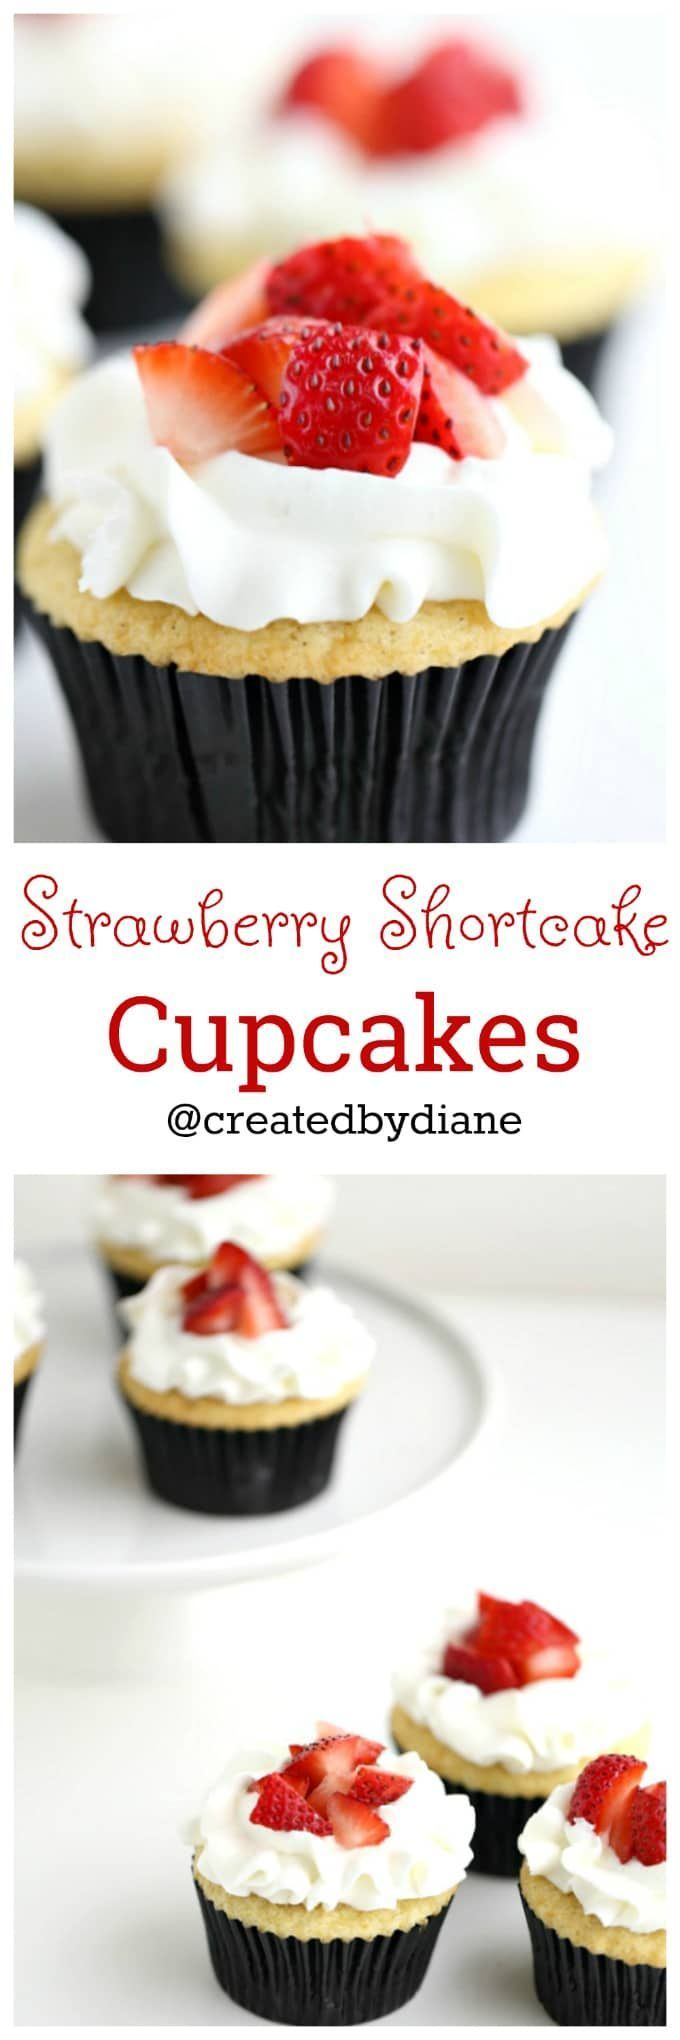 strawberry shortcake cupcakes fresh berries, fresh whipped cream is the perfect dessert @createdbydiane